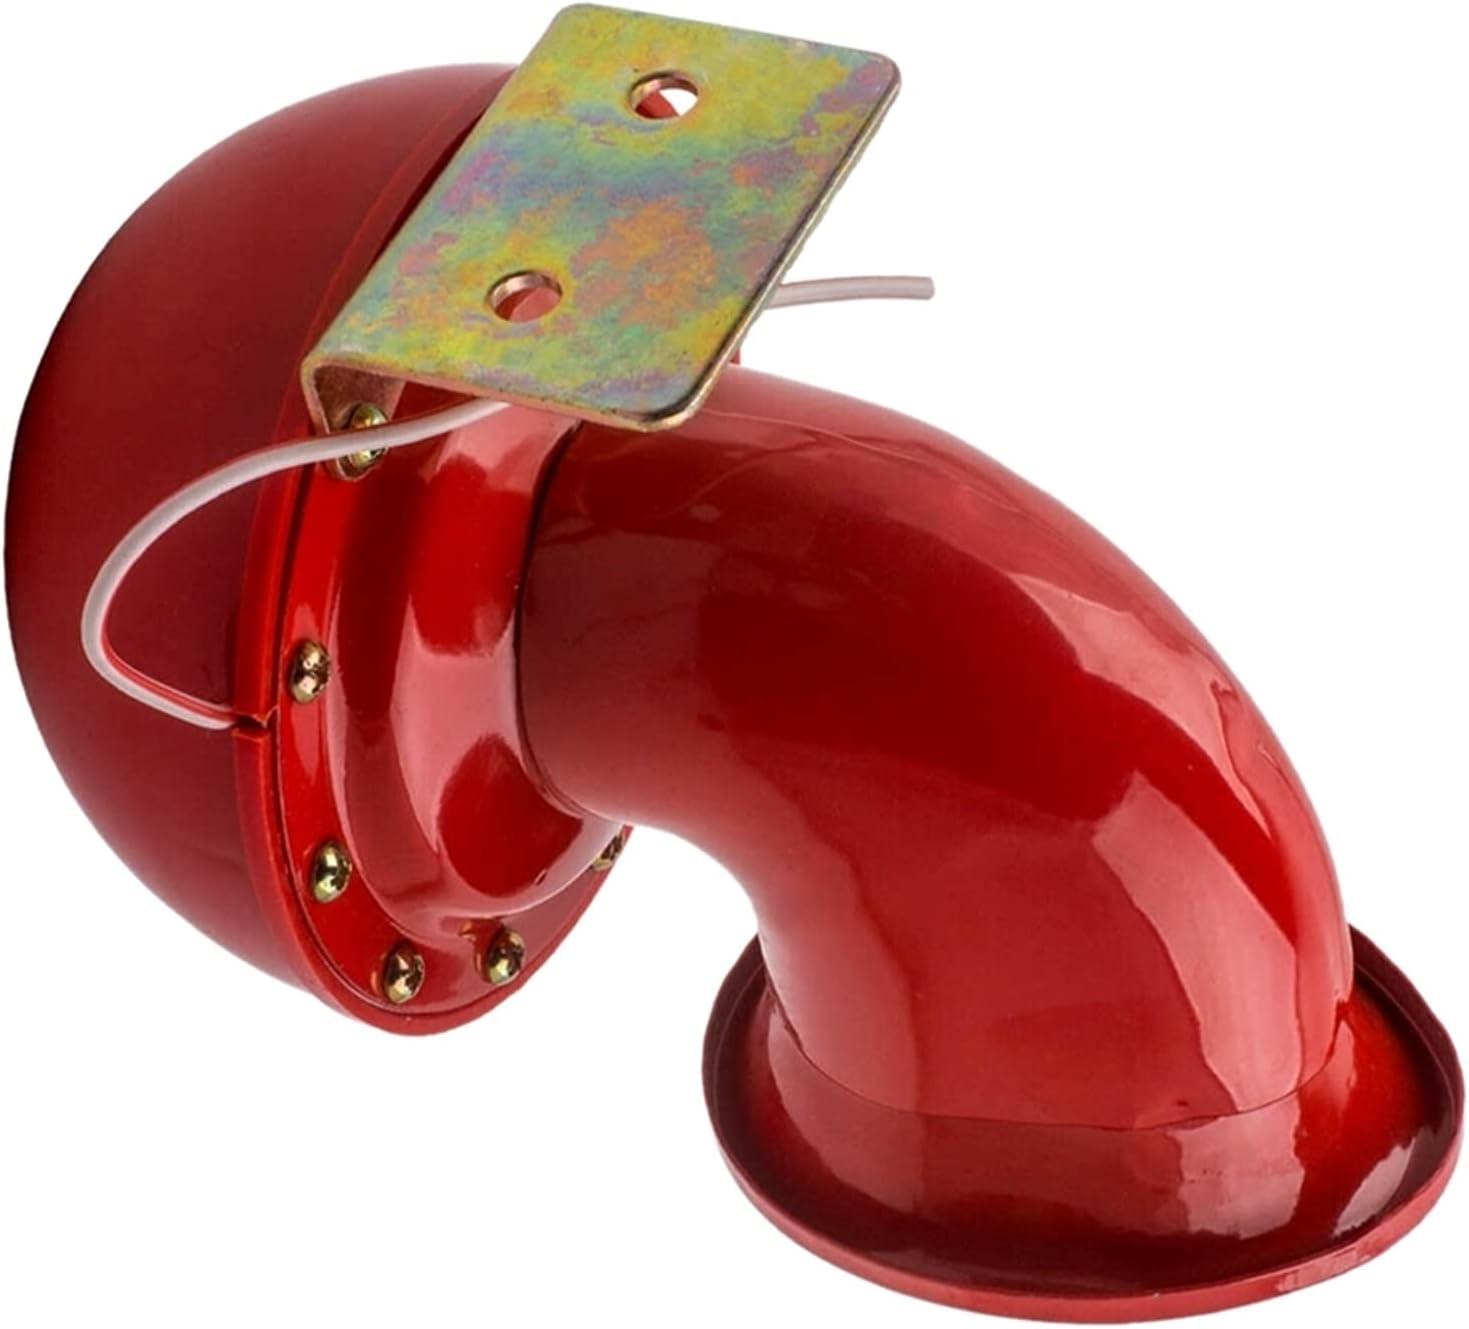 PINGPING JLIANG Store 200DB 12V Loud Sound Bull Max 58% OFF Electric Hor Max 73% OFF Air